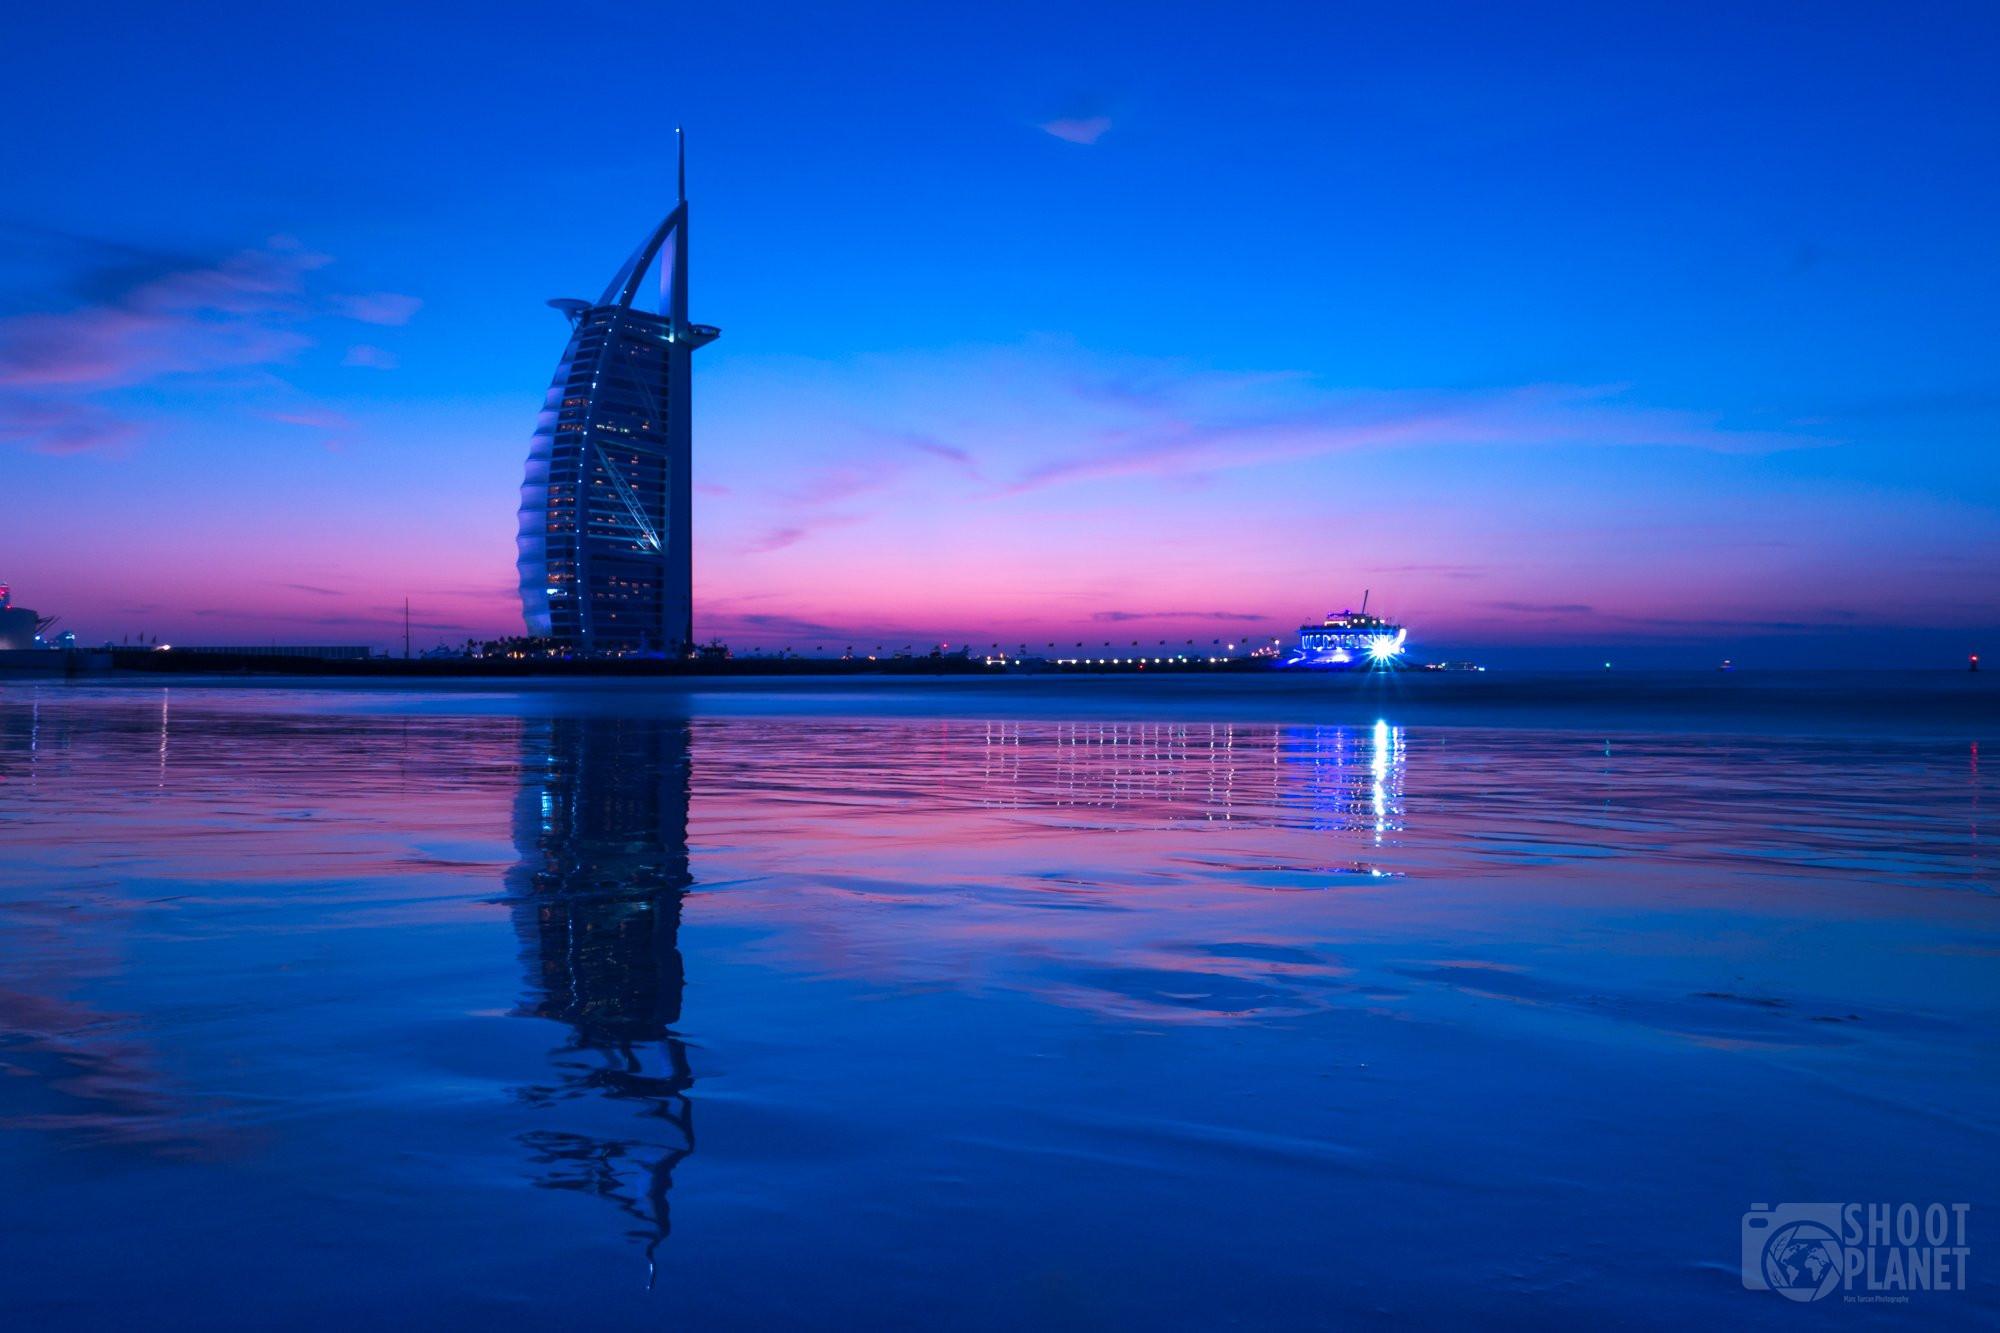 Burj Al Arab twilight reflections, Dubai